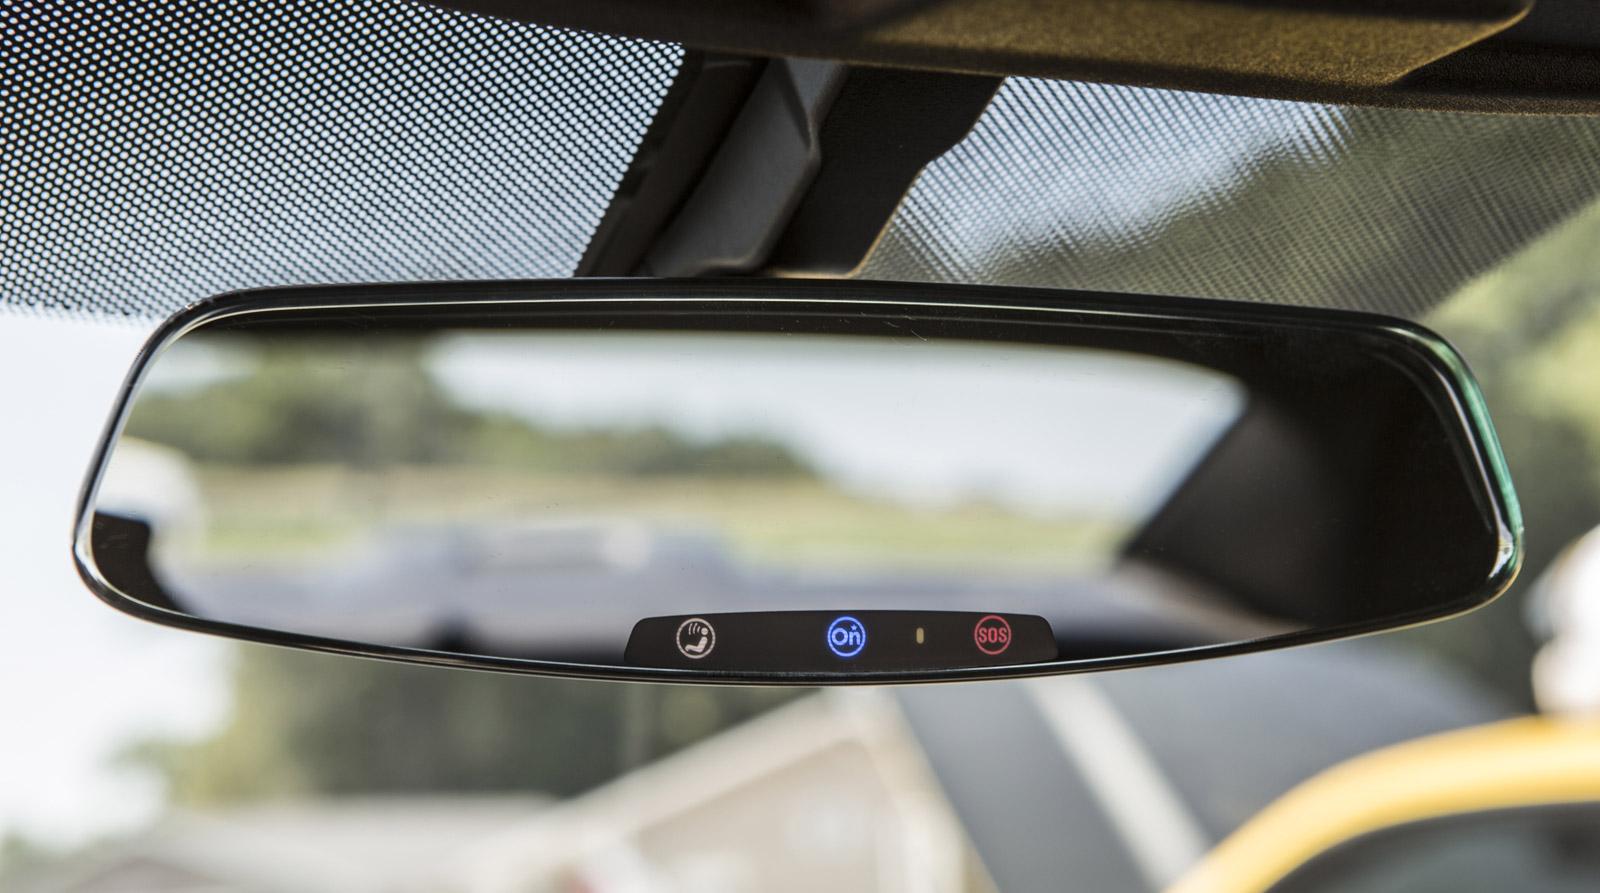 2005 Volkswagen Beetle Convertible Wiring Diagram 2013 Chevy Camaro Gets Frameless Rear View Mirror In